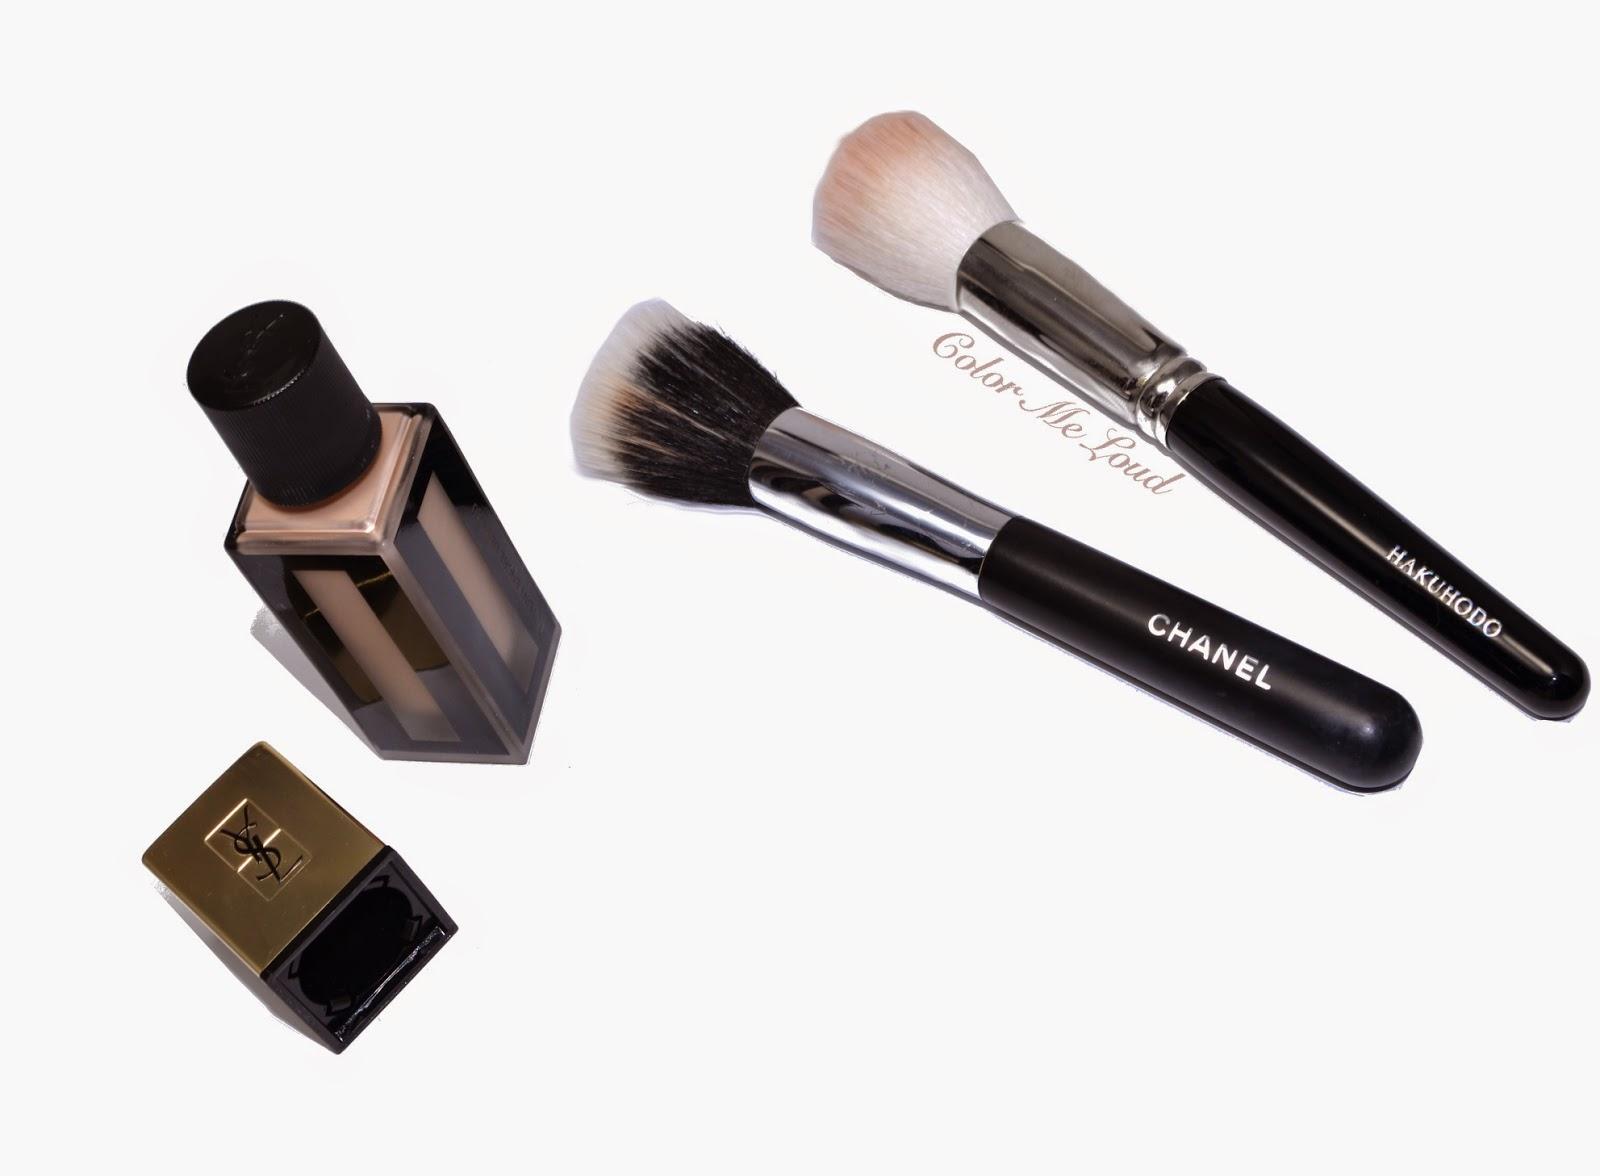 Yves Saint Lau Makeup Brushes Review Saubhaya Makeup